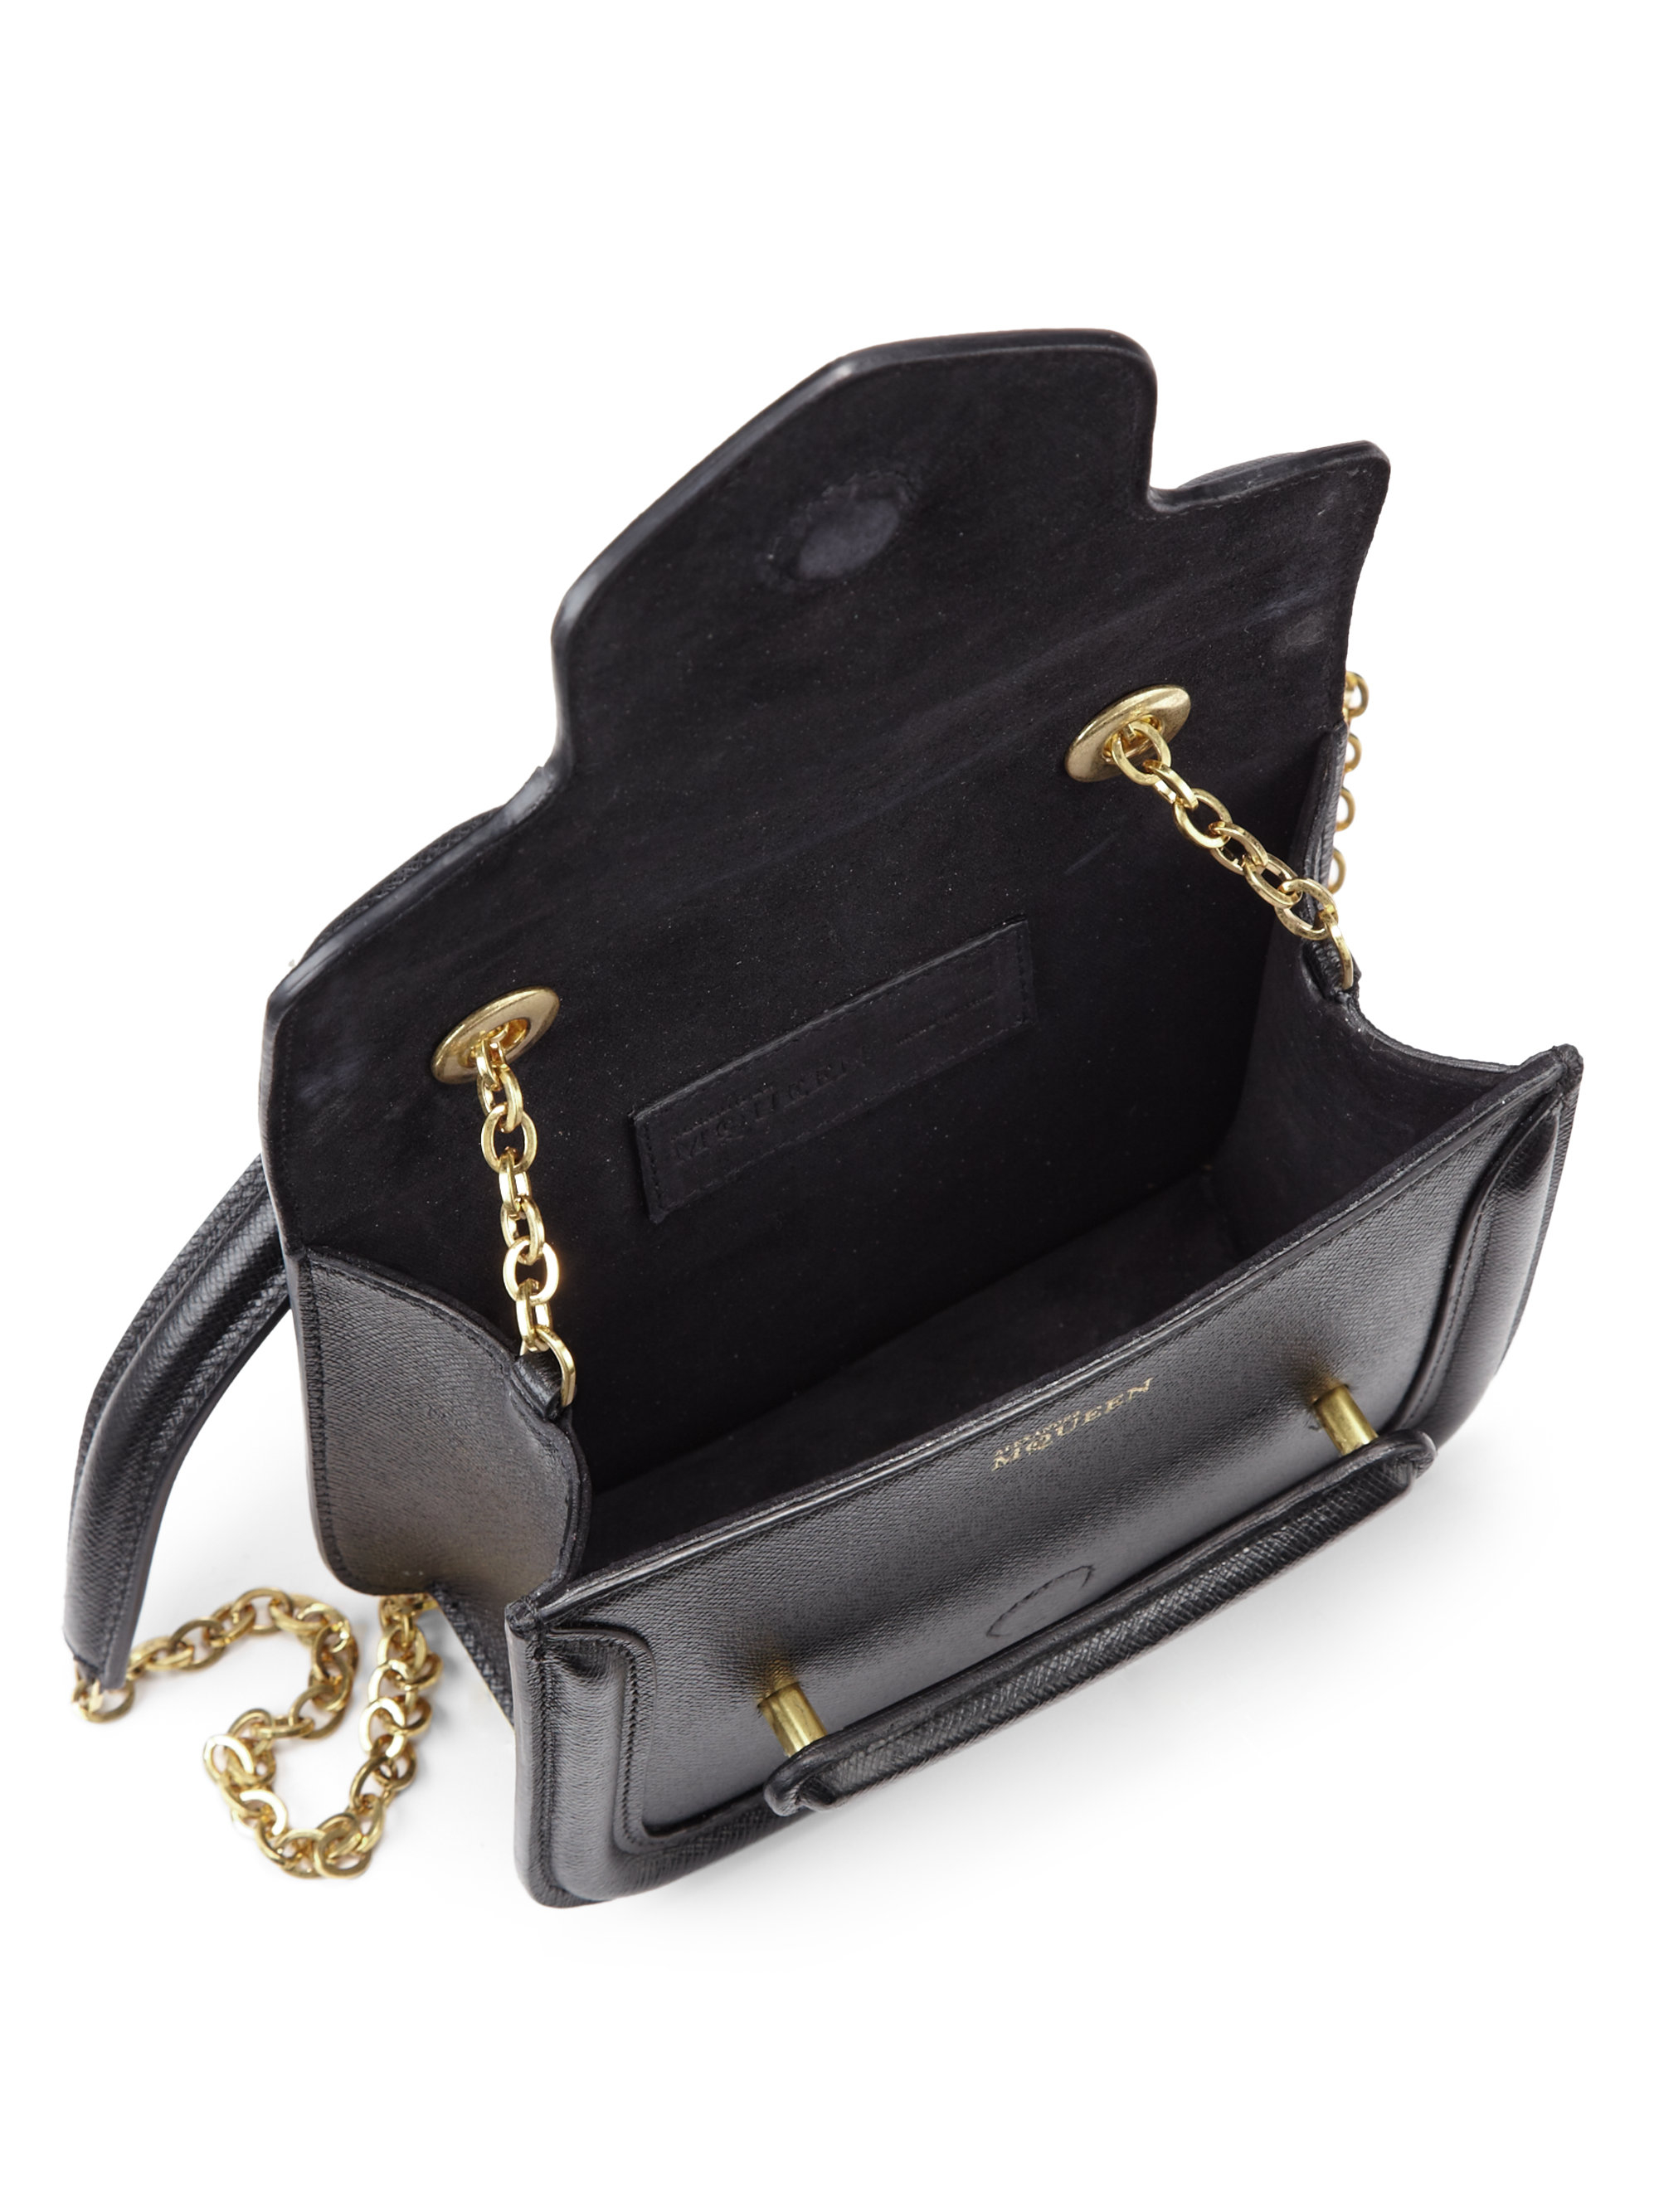 crossbody bag - Black Alexander McQueen r2cjzM